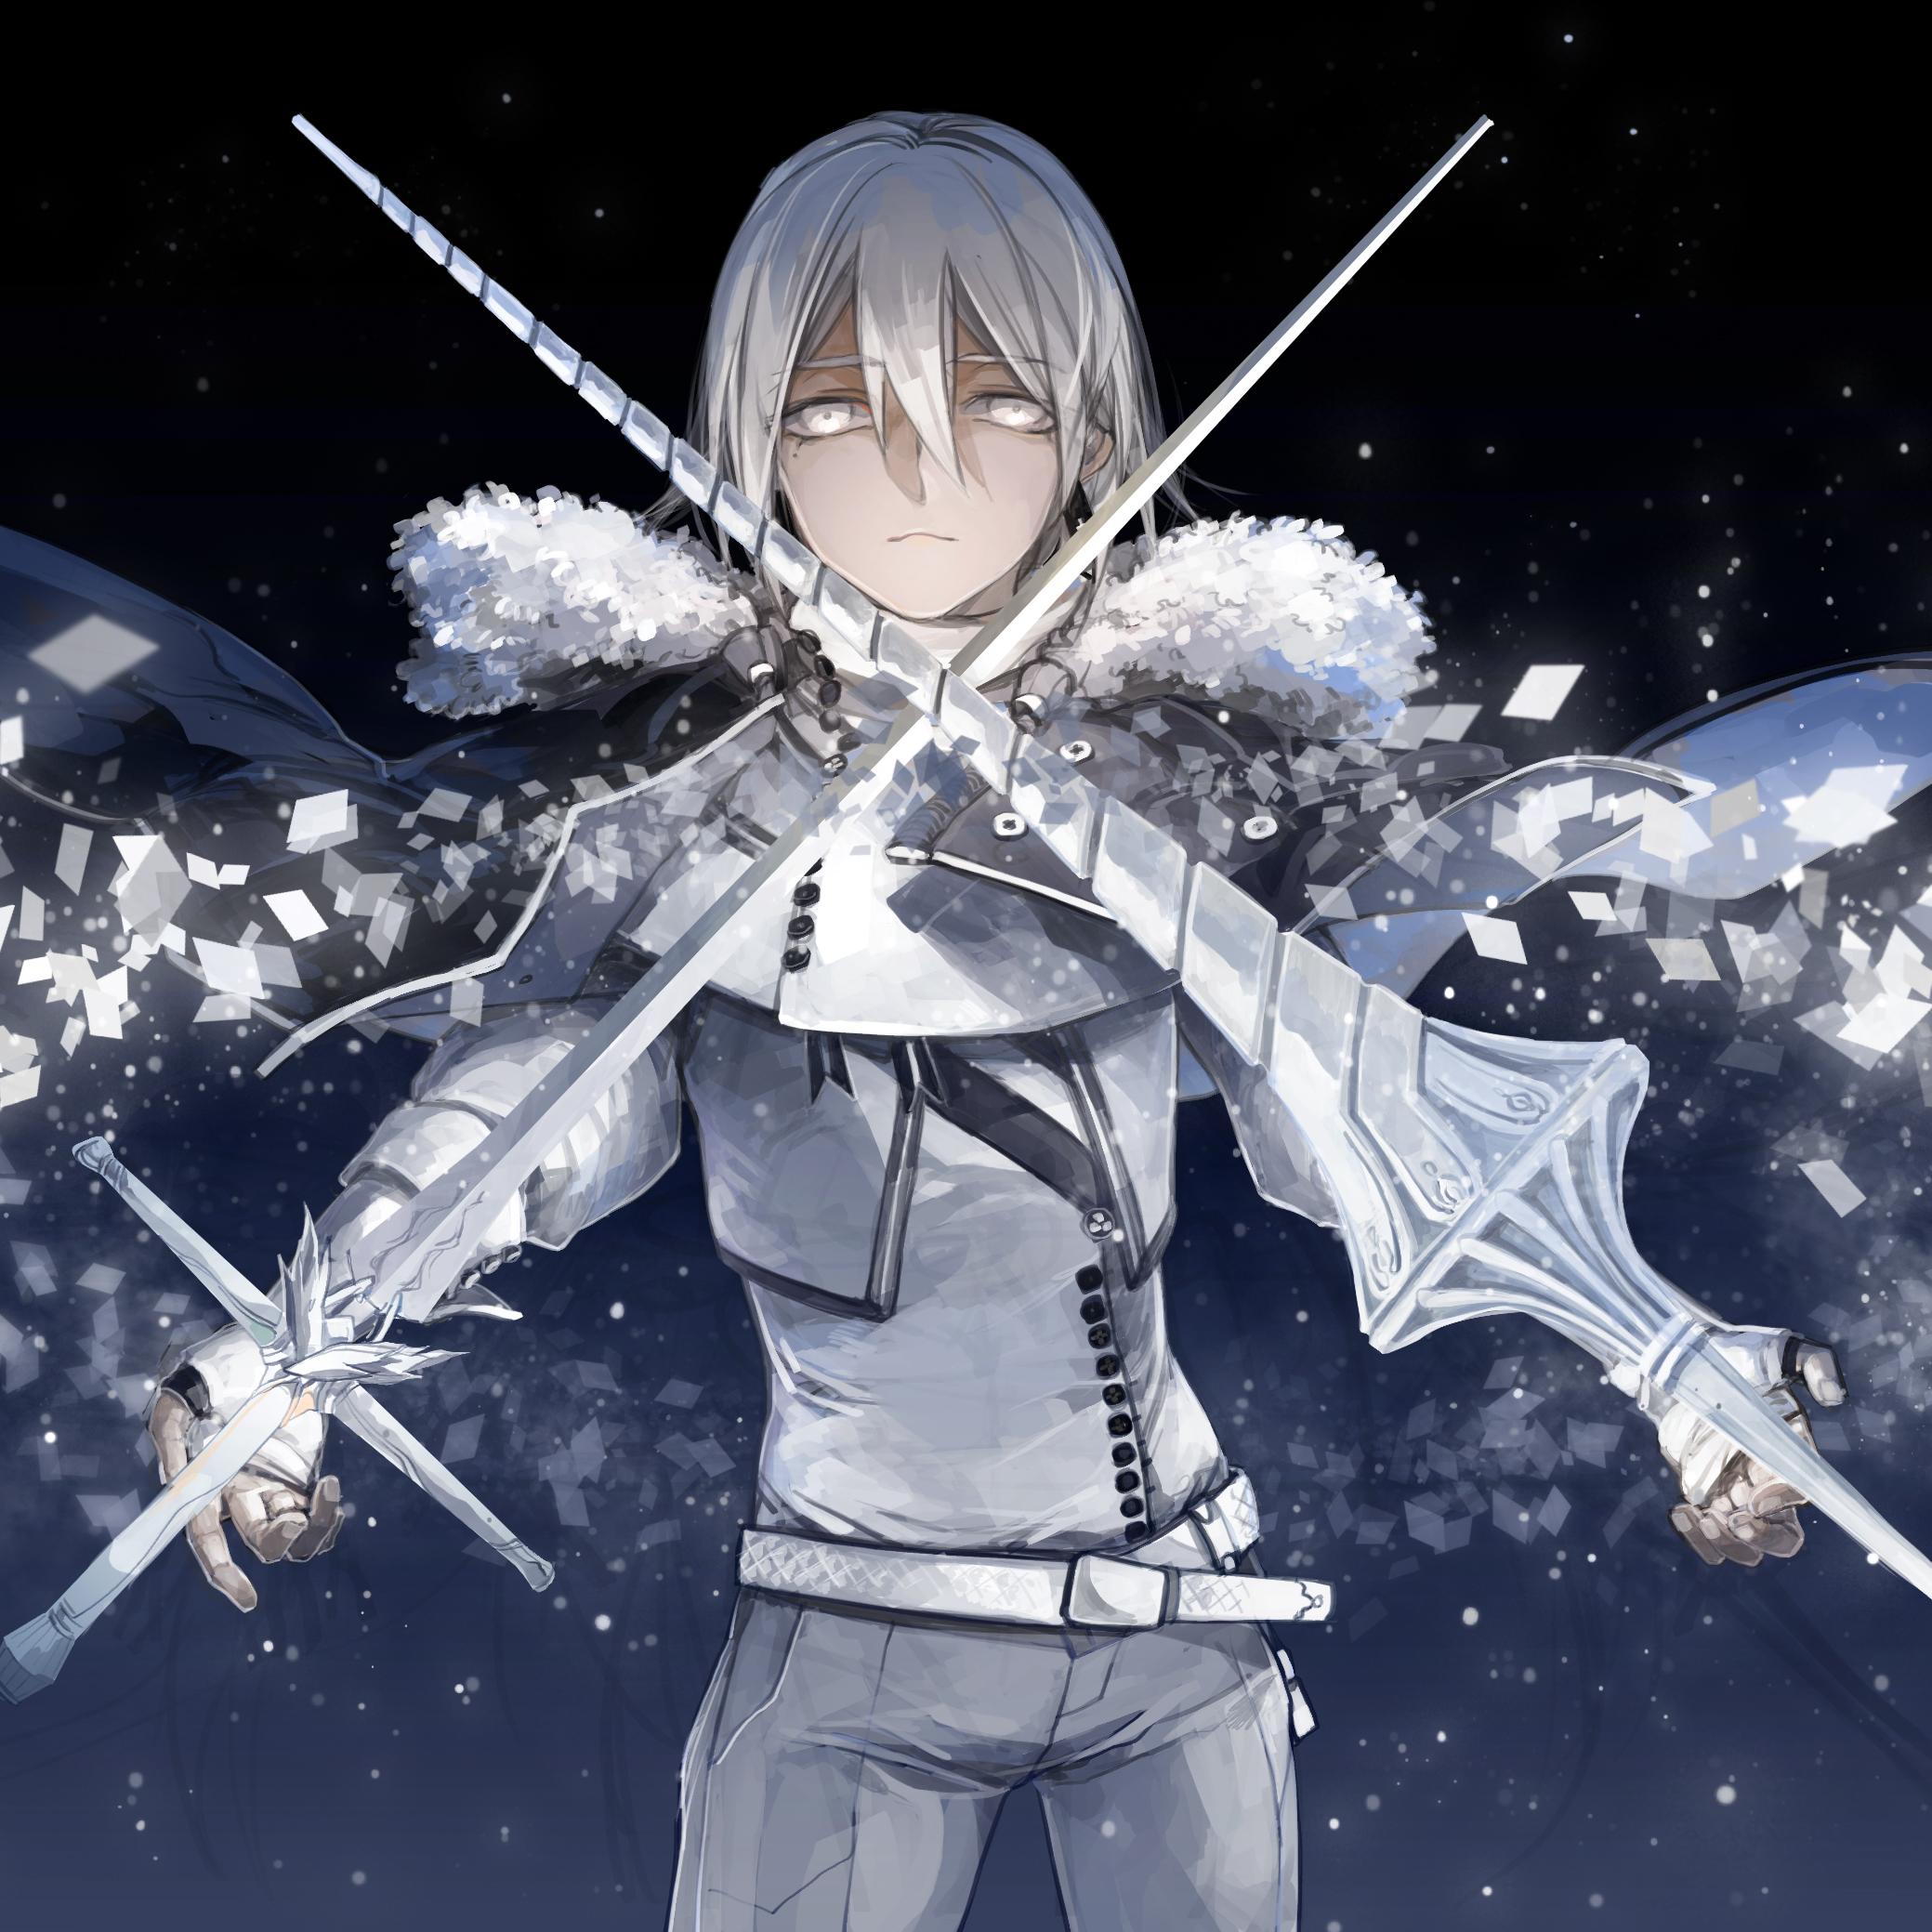 Anime Characters Use Dual Swords : Pixiv fantasia fallen kings zerochan